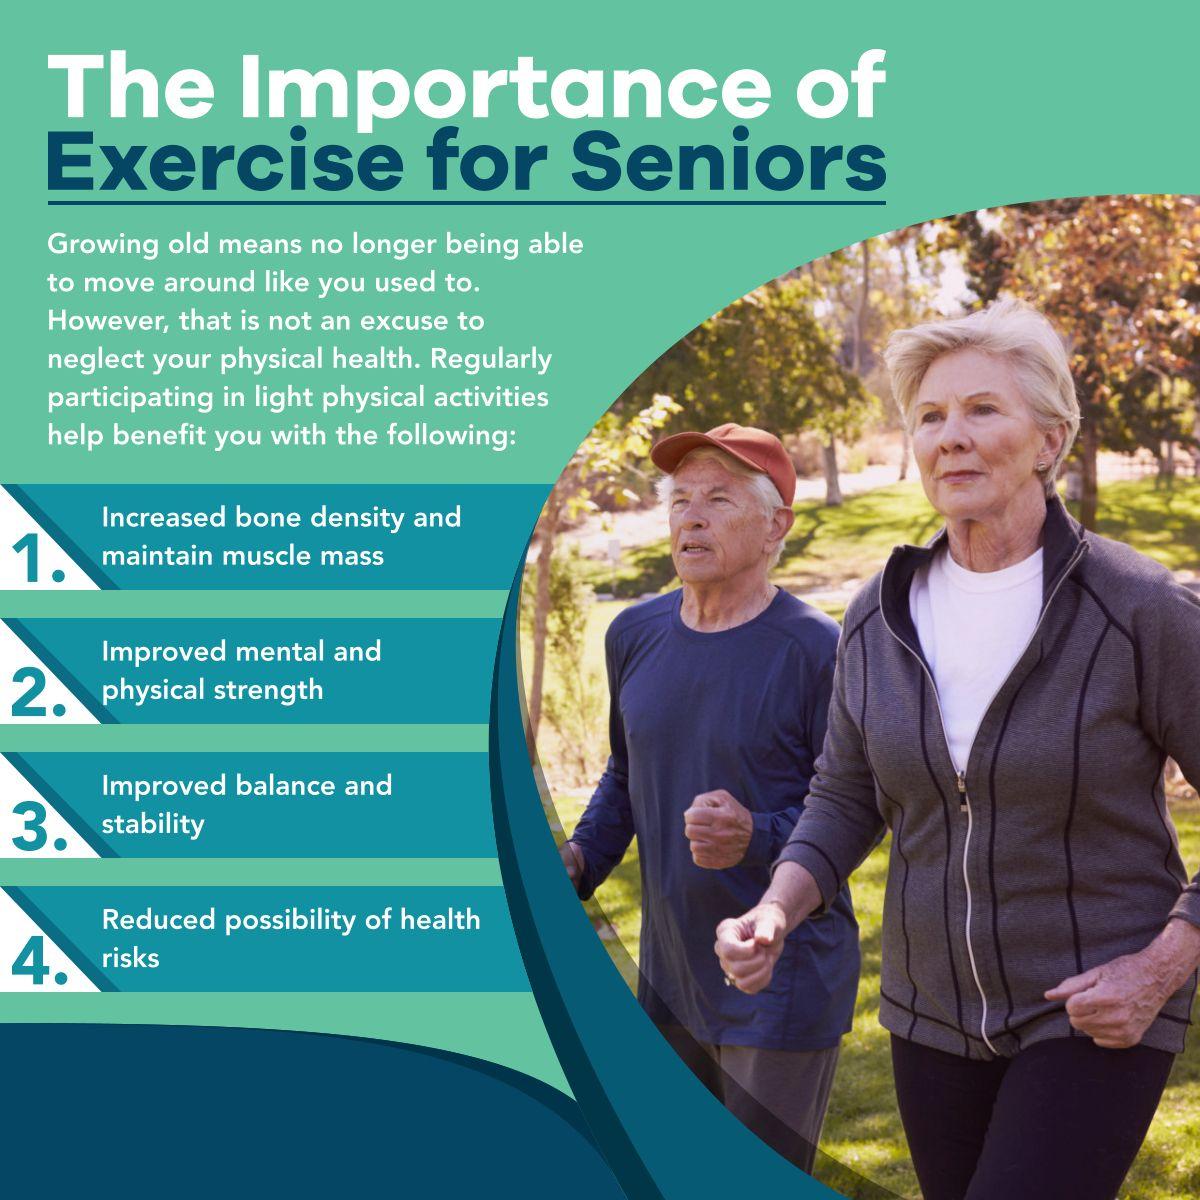 Home Home health services, Health care services, Senior